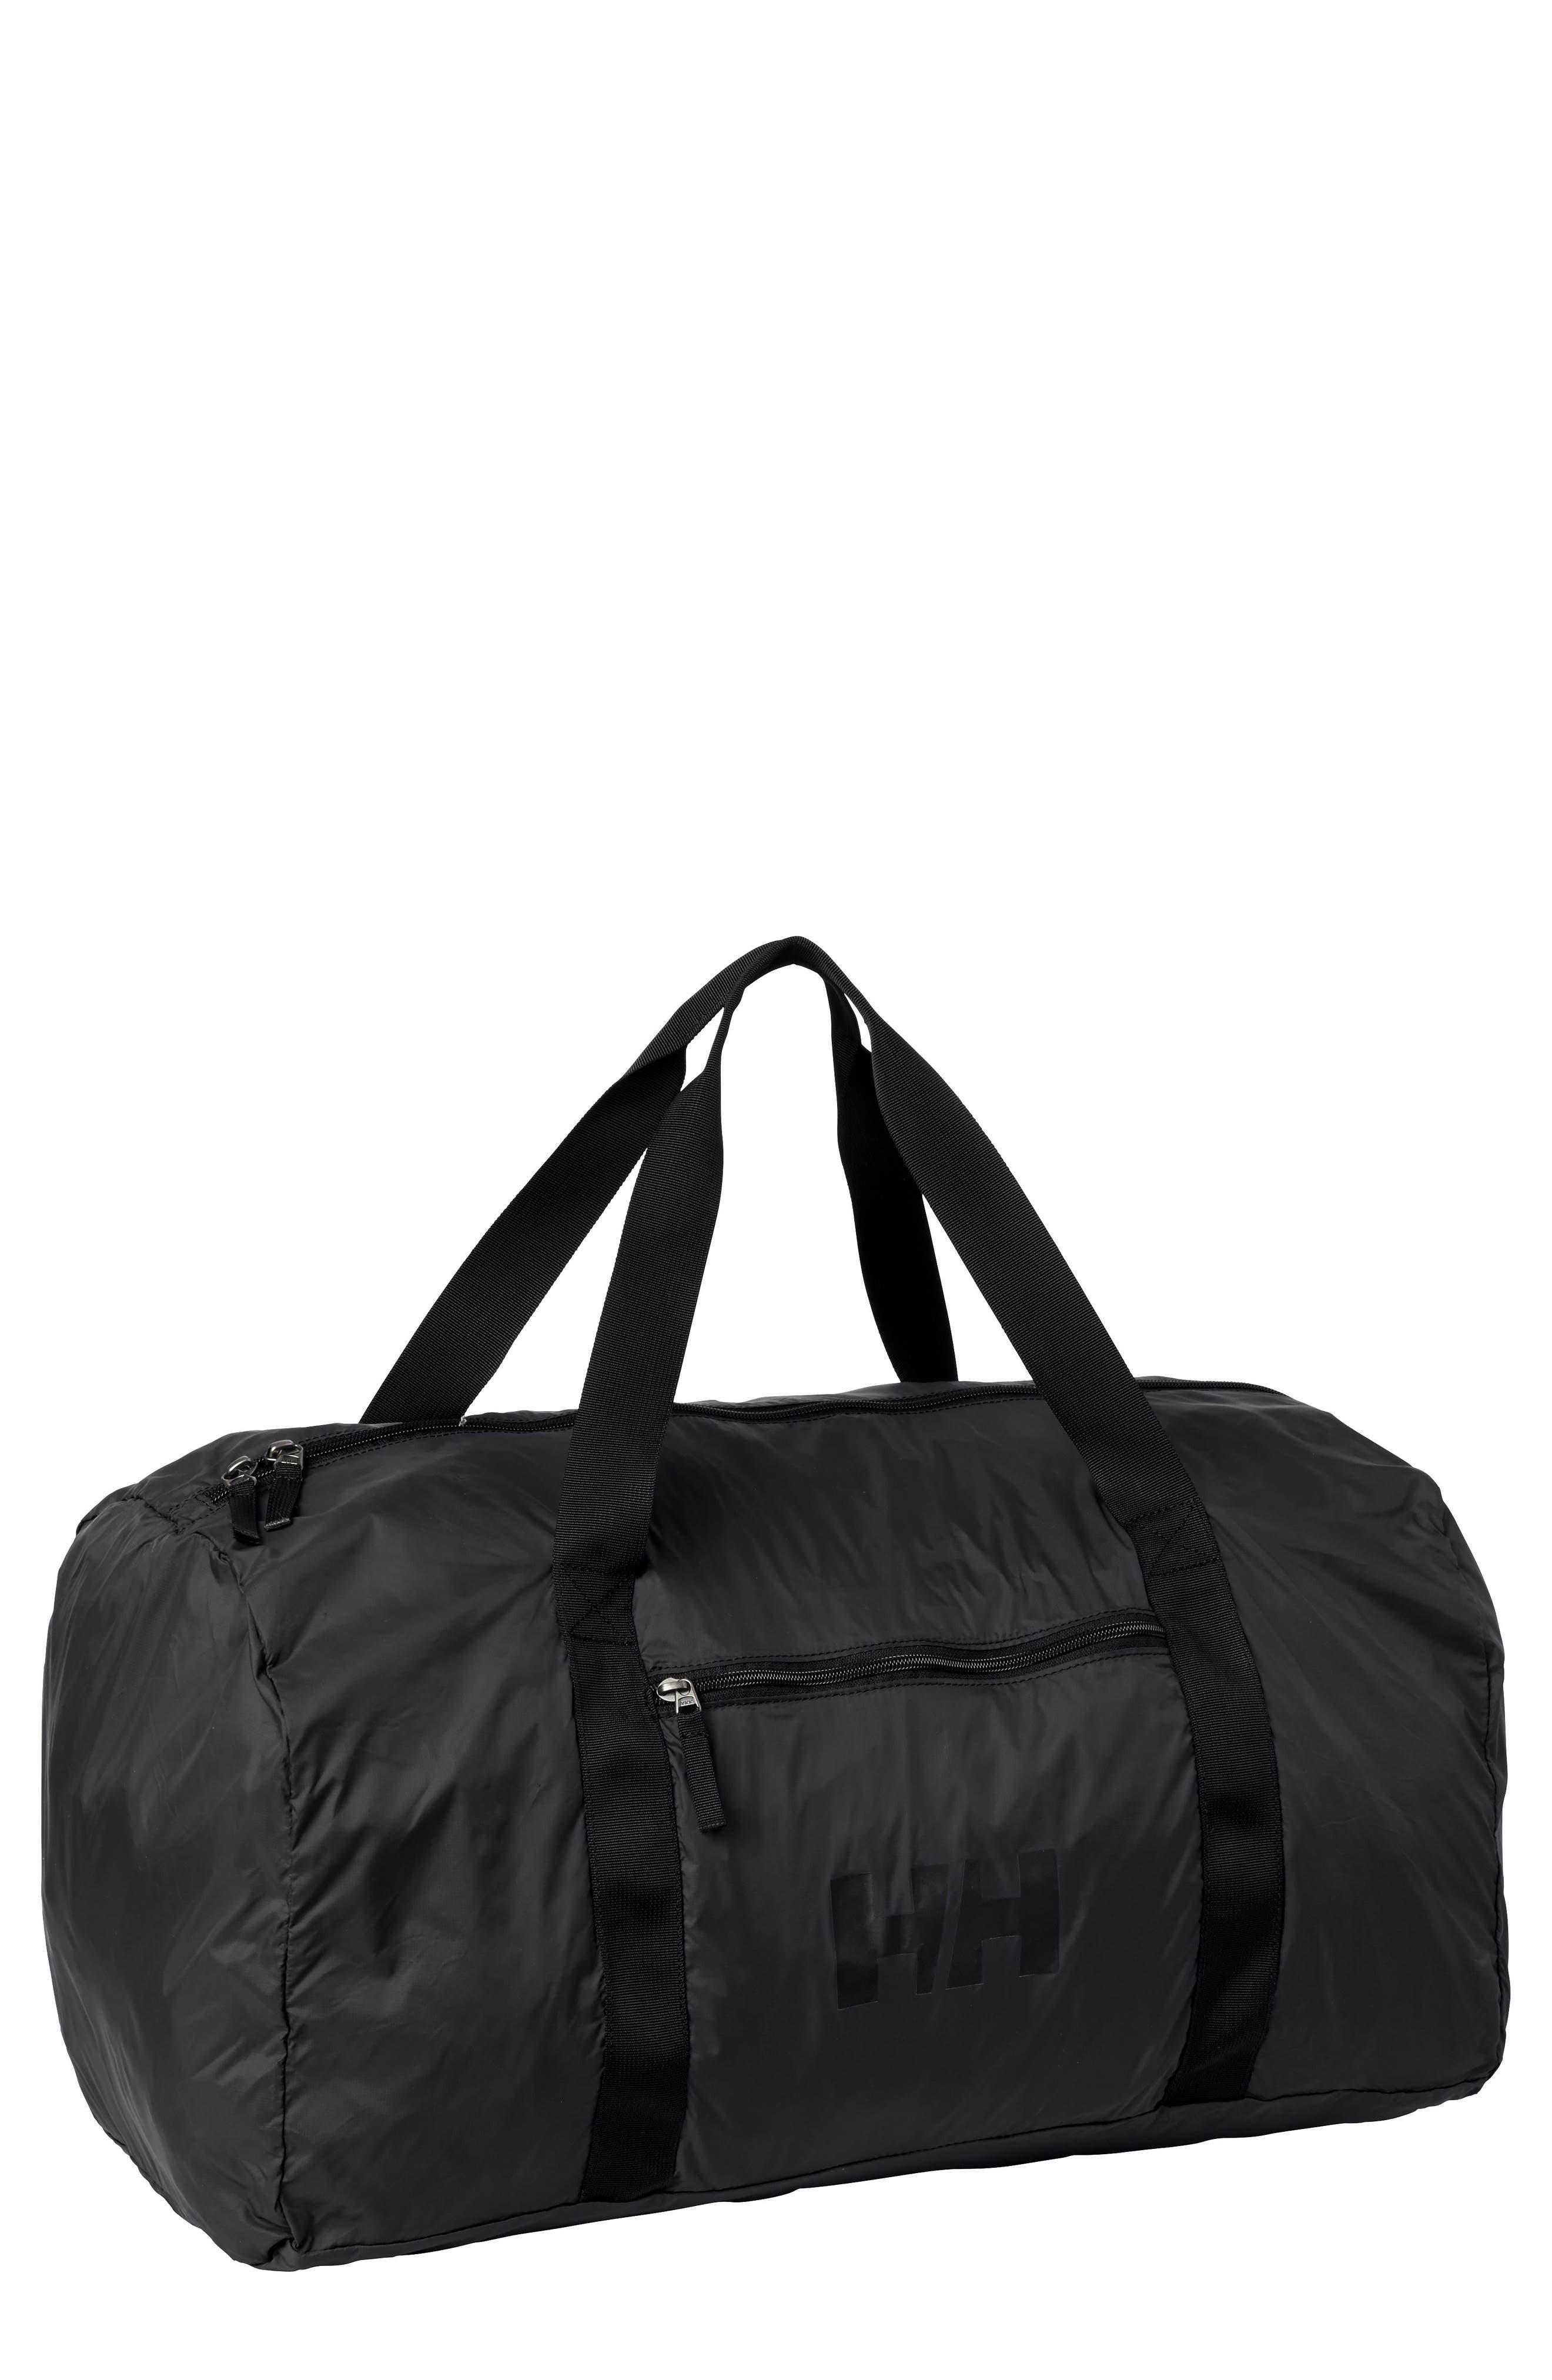 Small Packable Duffel Bag,                             Main thumbnail 1, color,                             Black